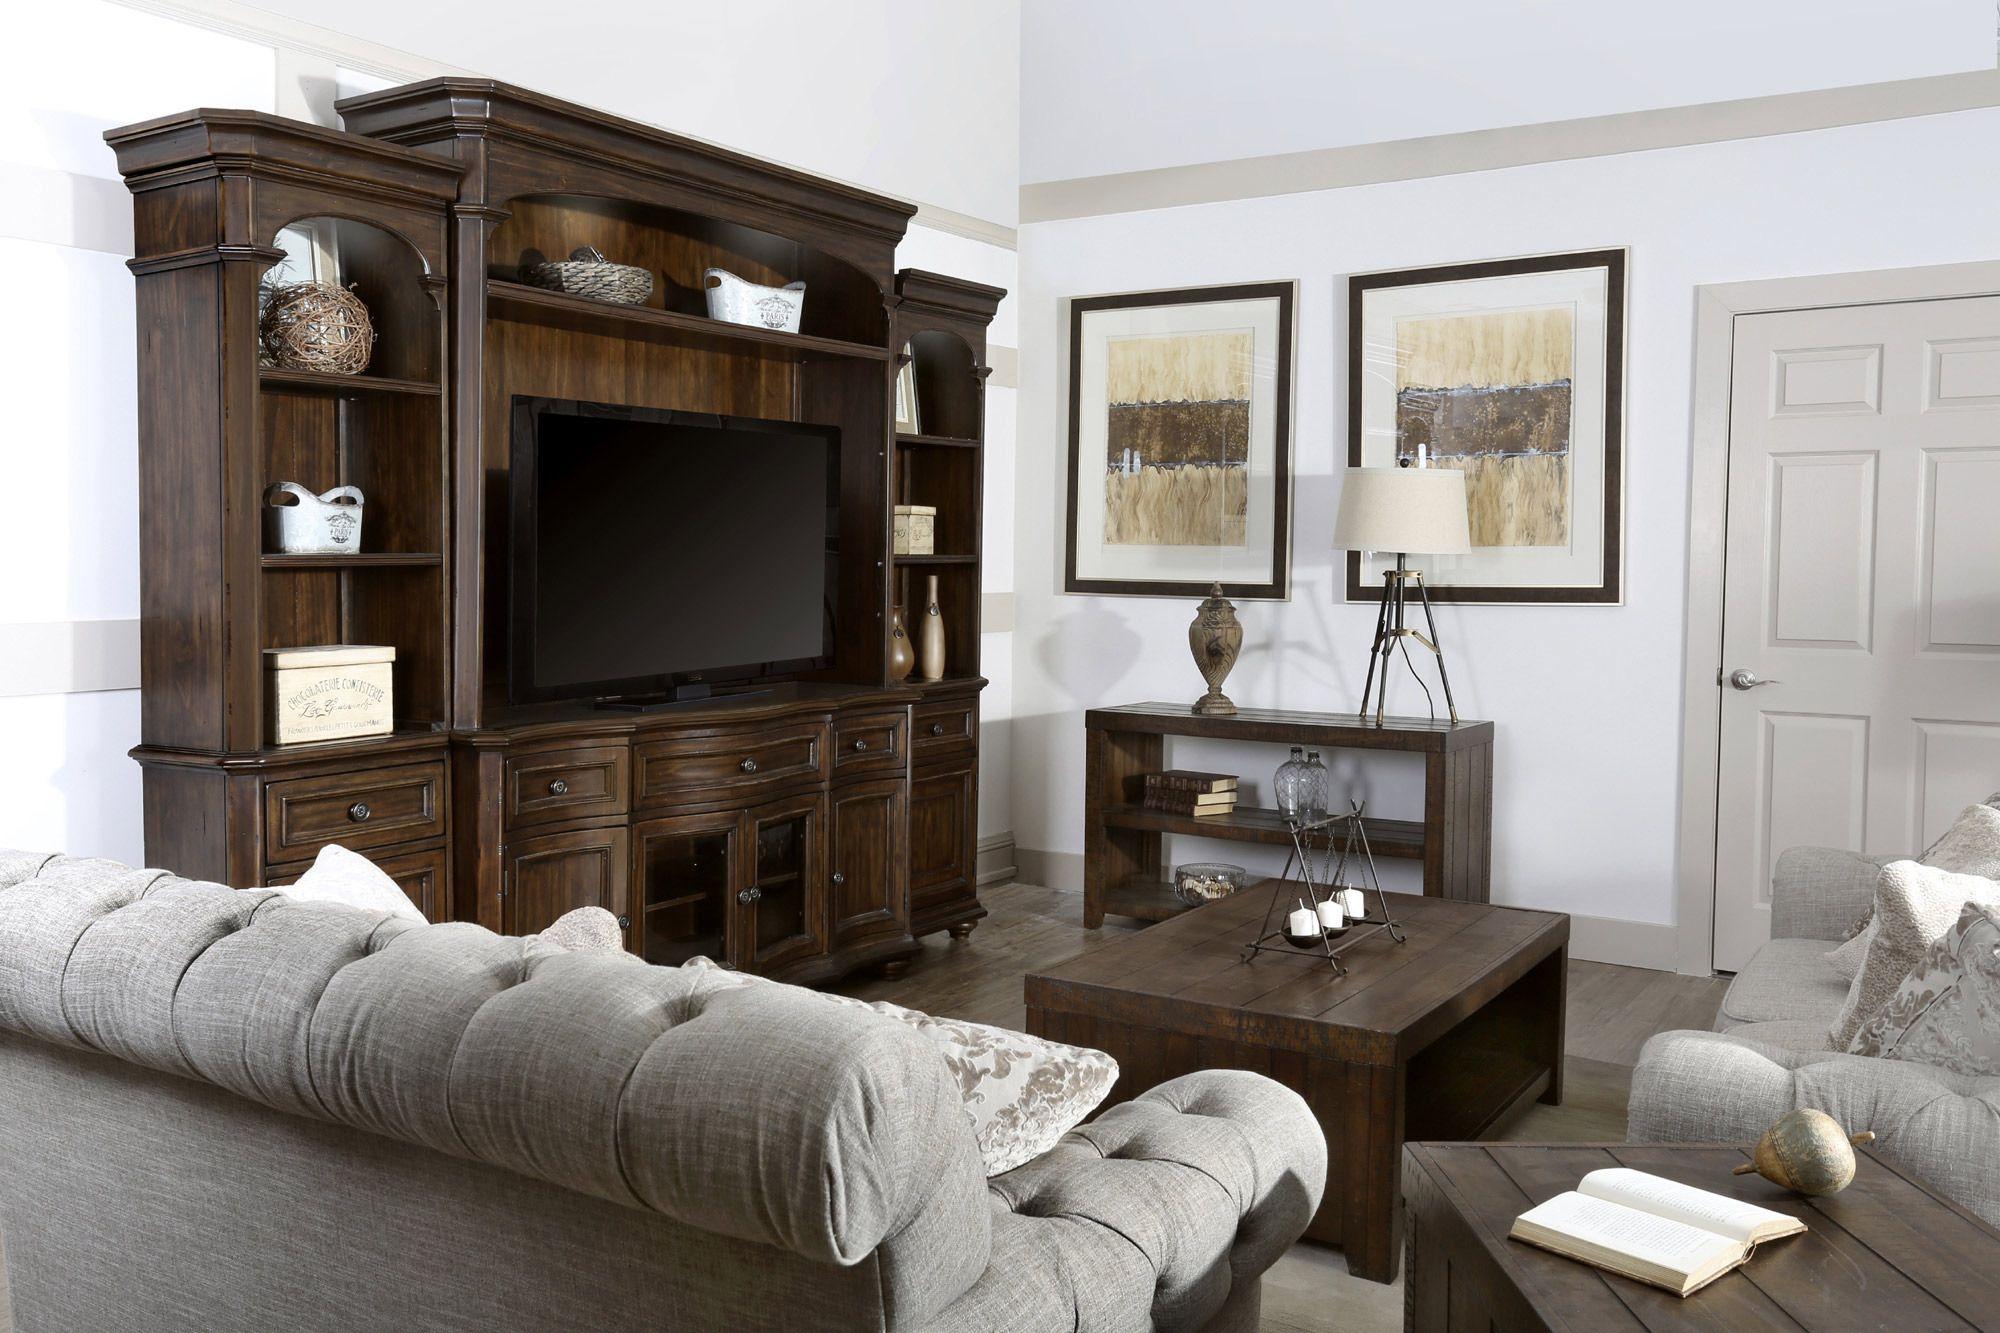 Kessington entertainment wall magnussen furniture home gallery